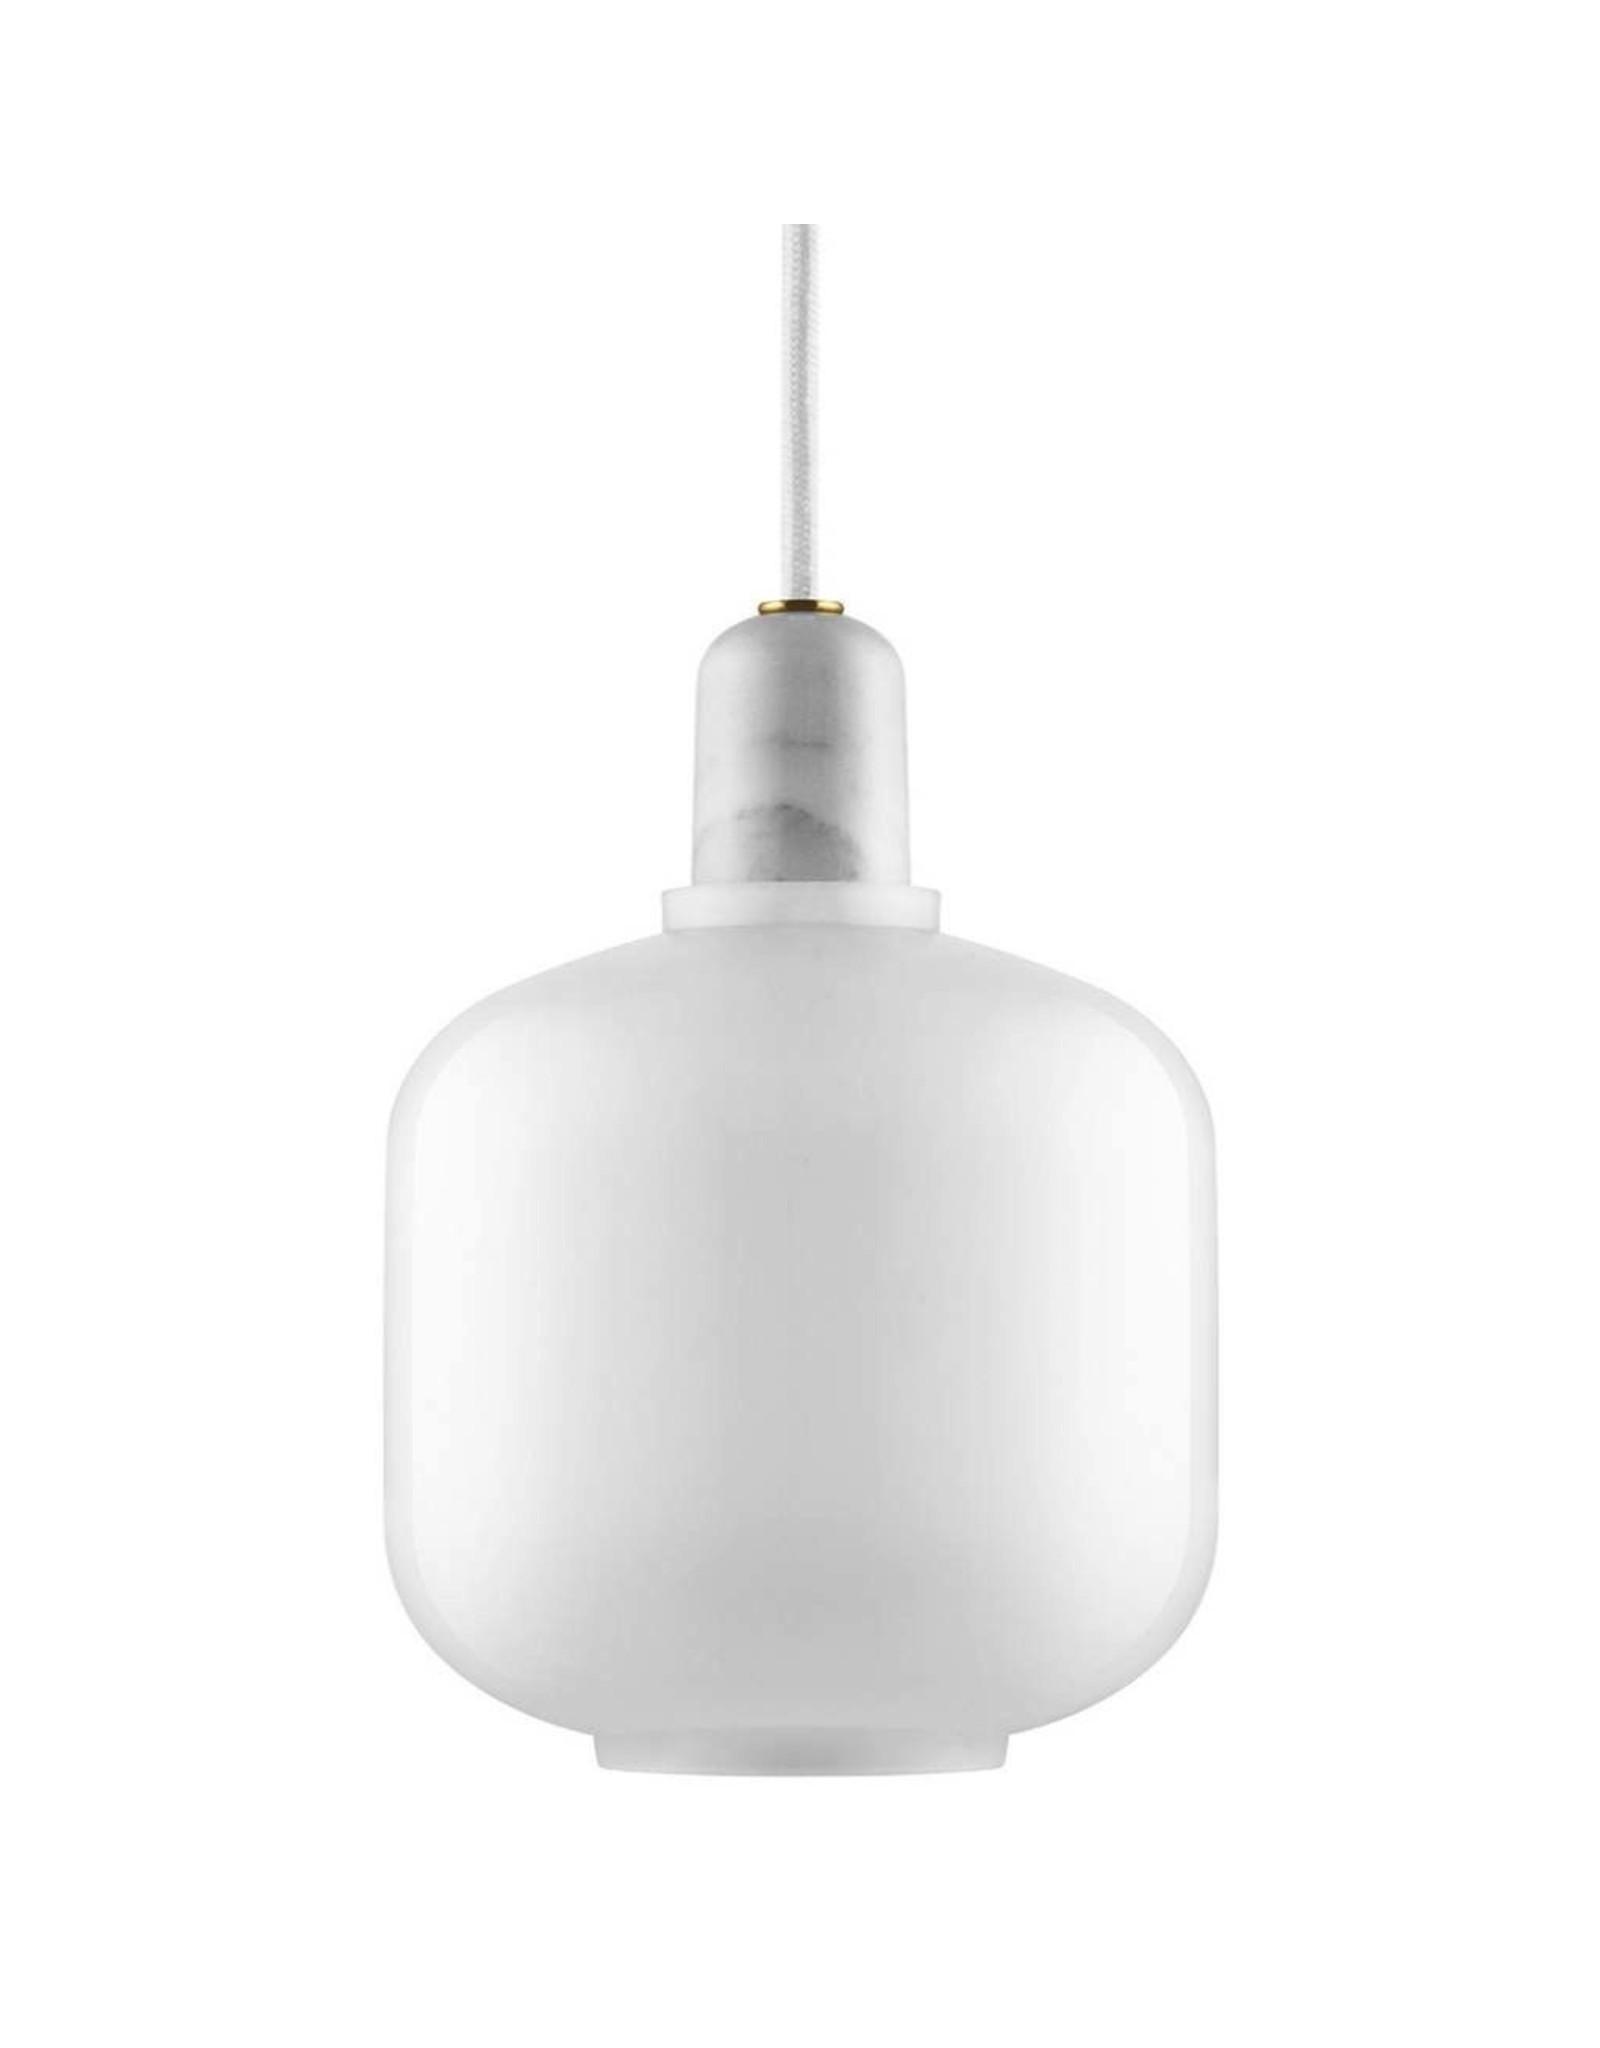 Normann Copenhagen Amp Lamp Small White/White